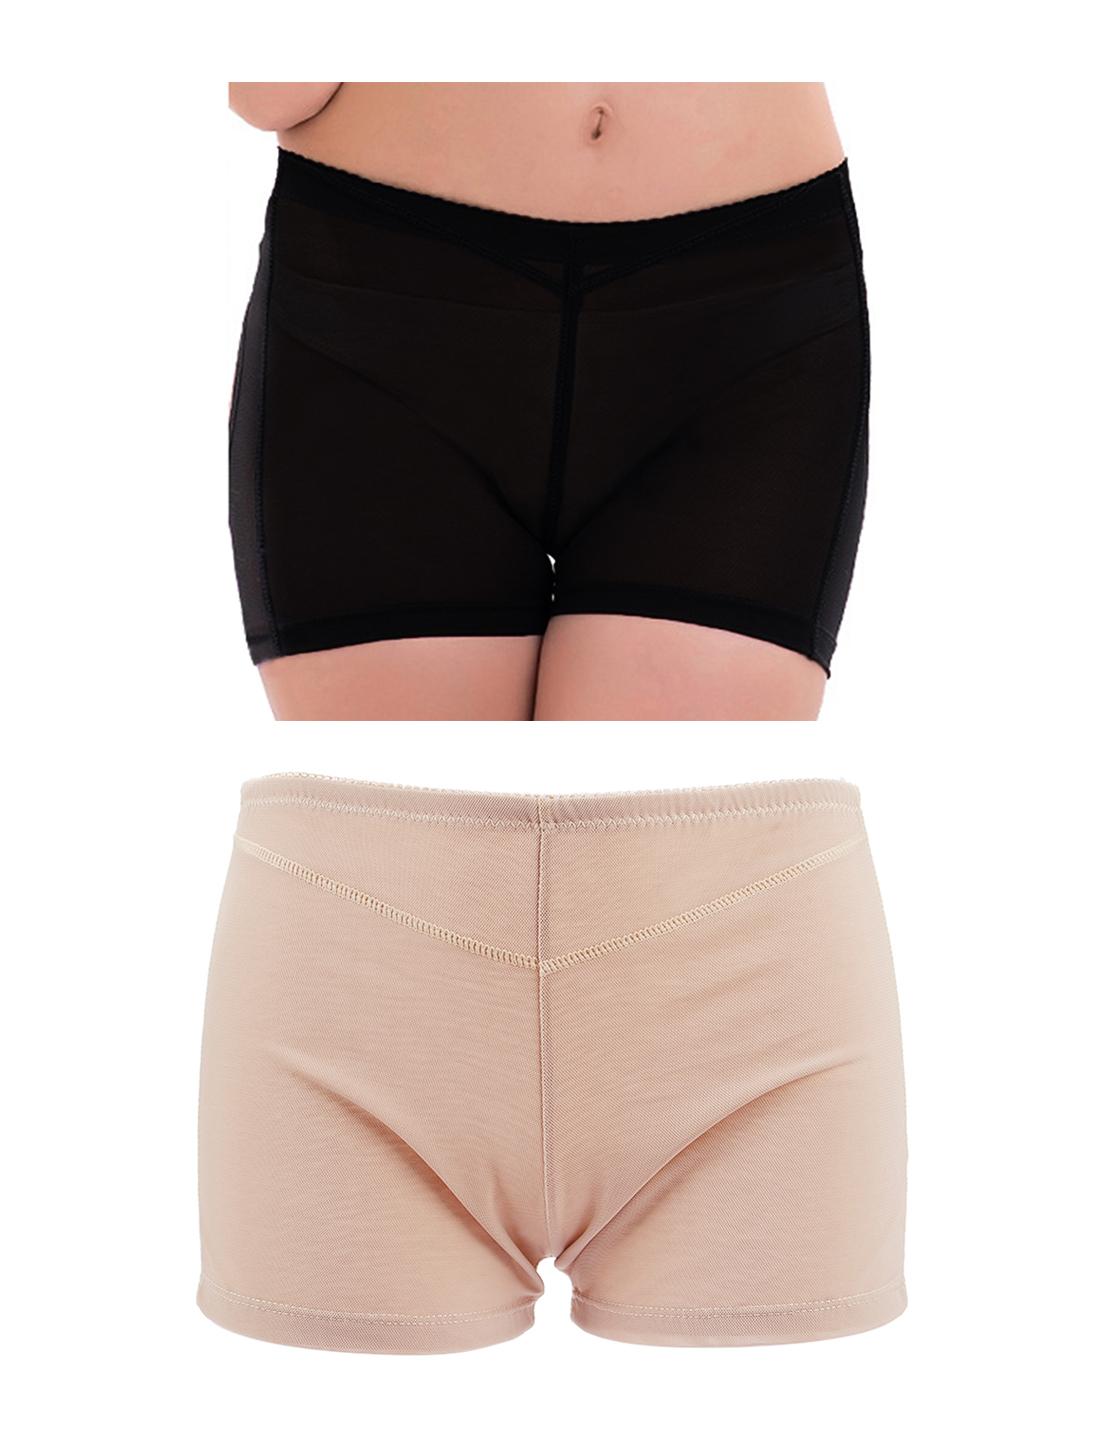 Women Butt Lifter Tummy Control Shapewear Enhancer Boyshort Underwear Beige Black XX-Large